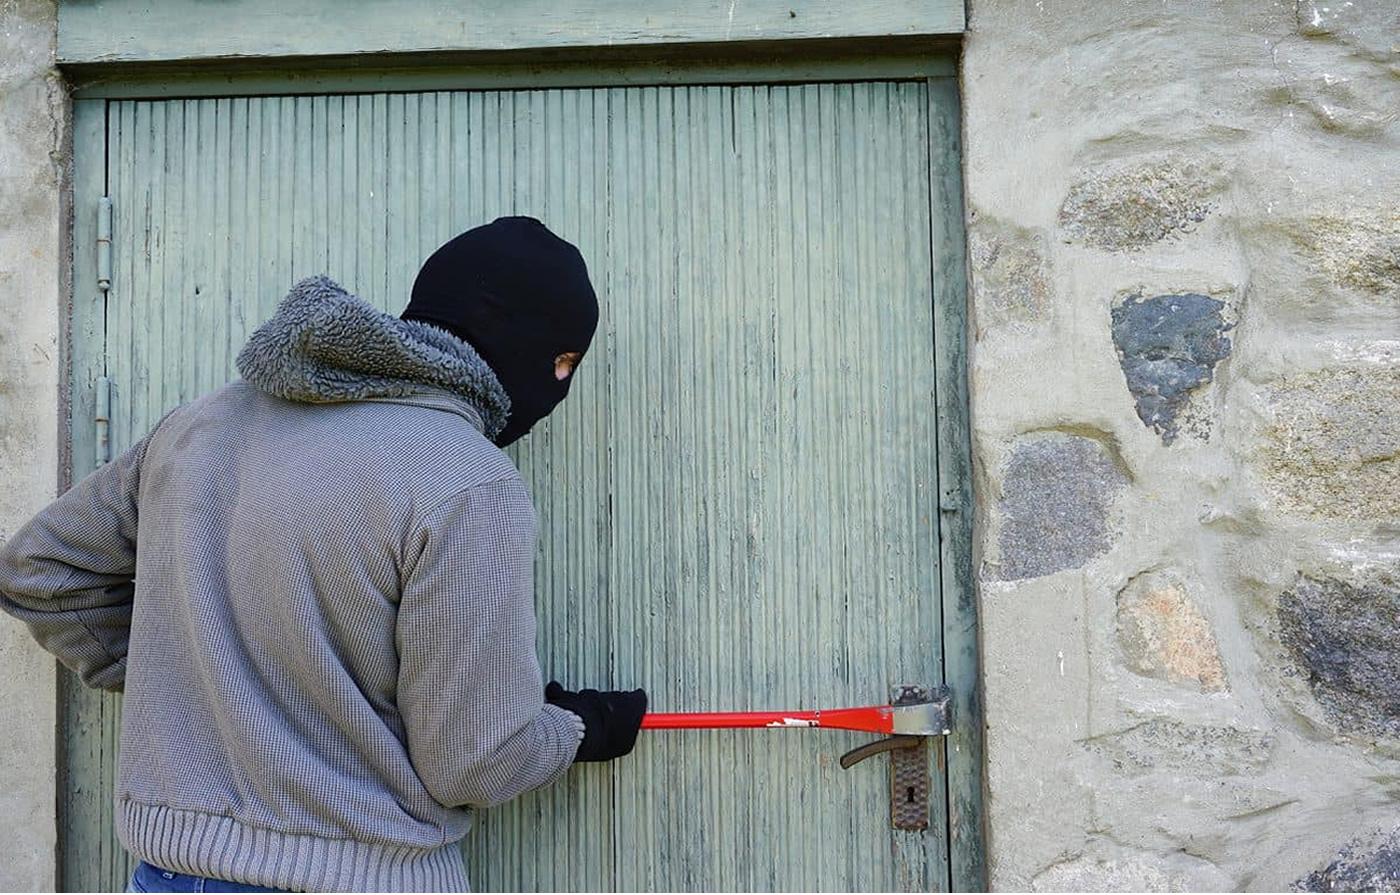 Robberies - house break ins